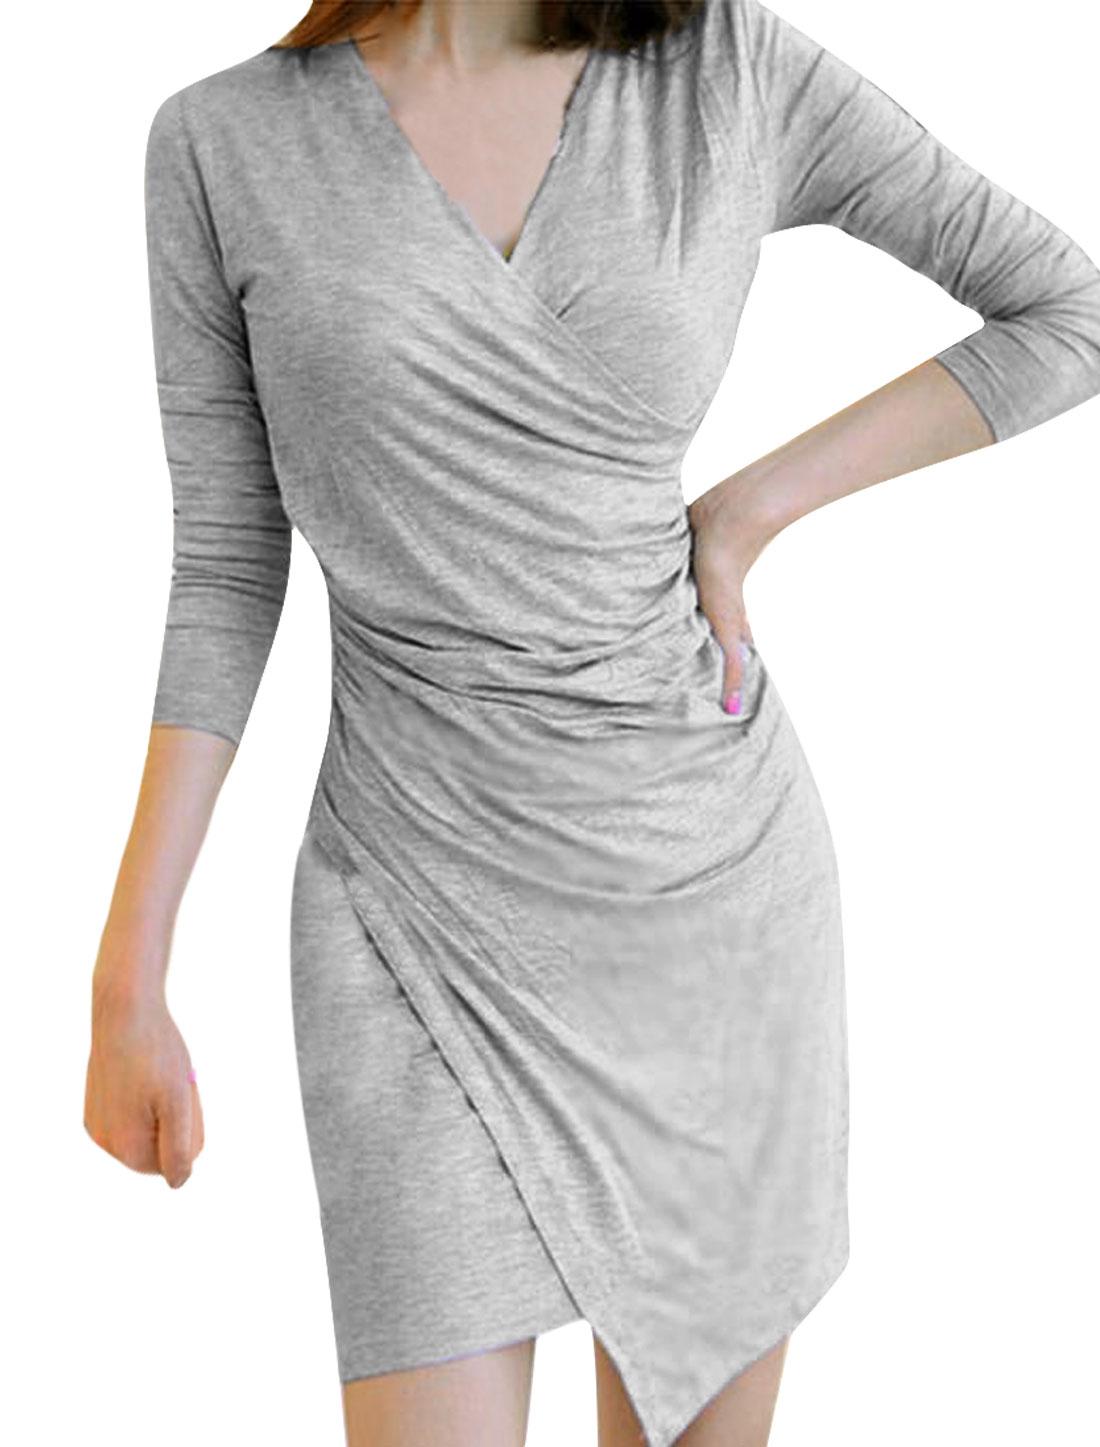 Lady V Neck Long-sleeved Elastic Pullover Design Gray Dress XS